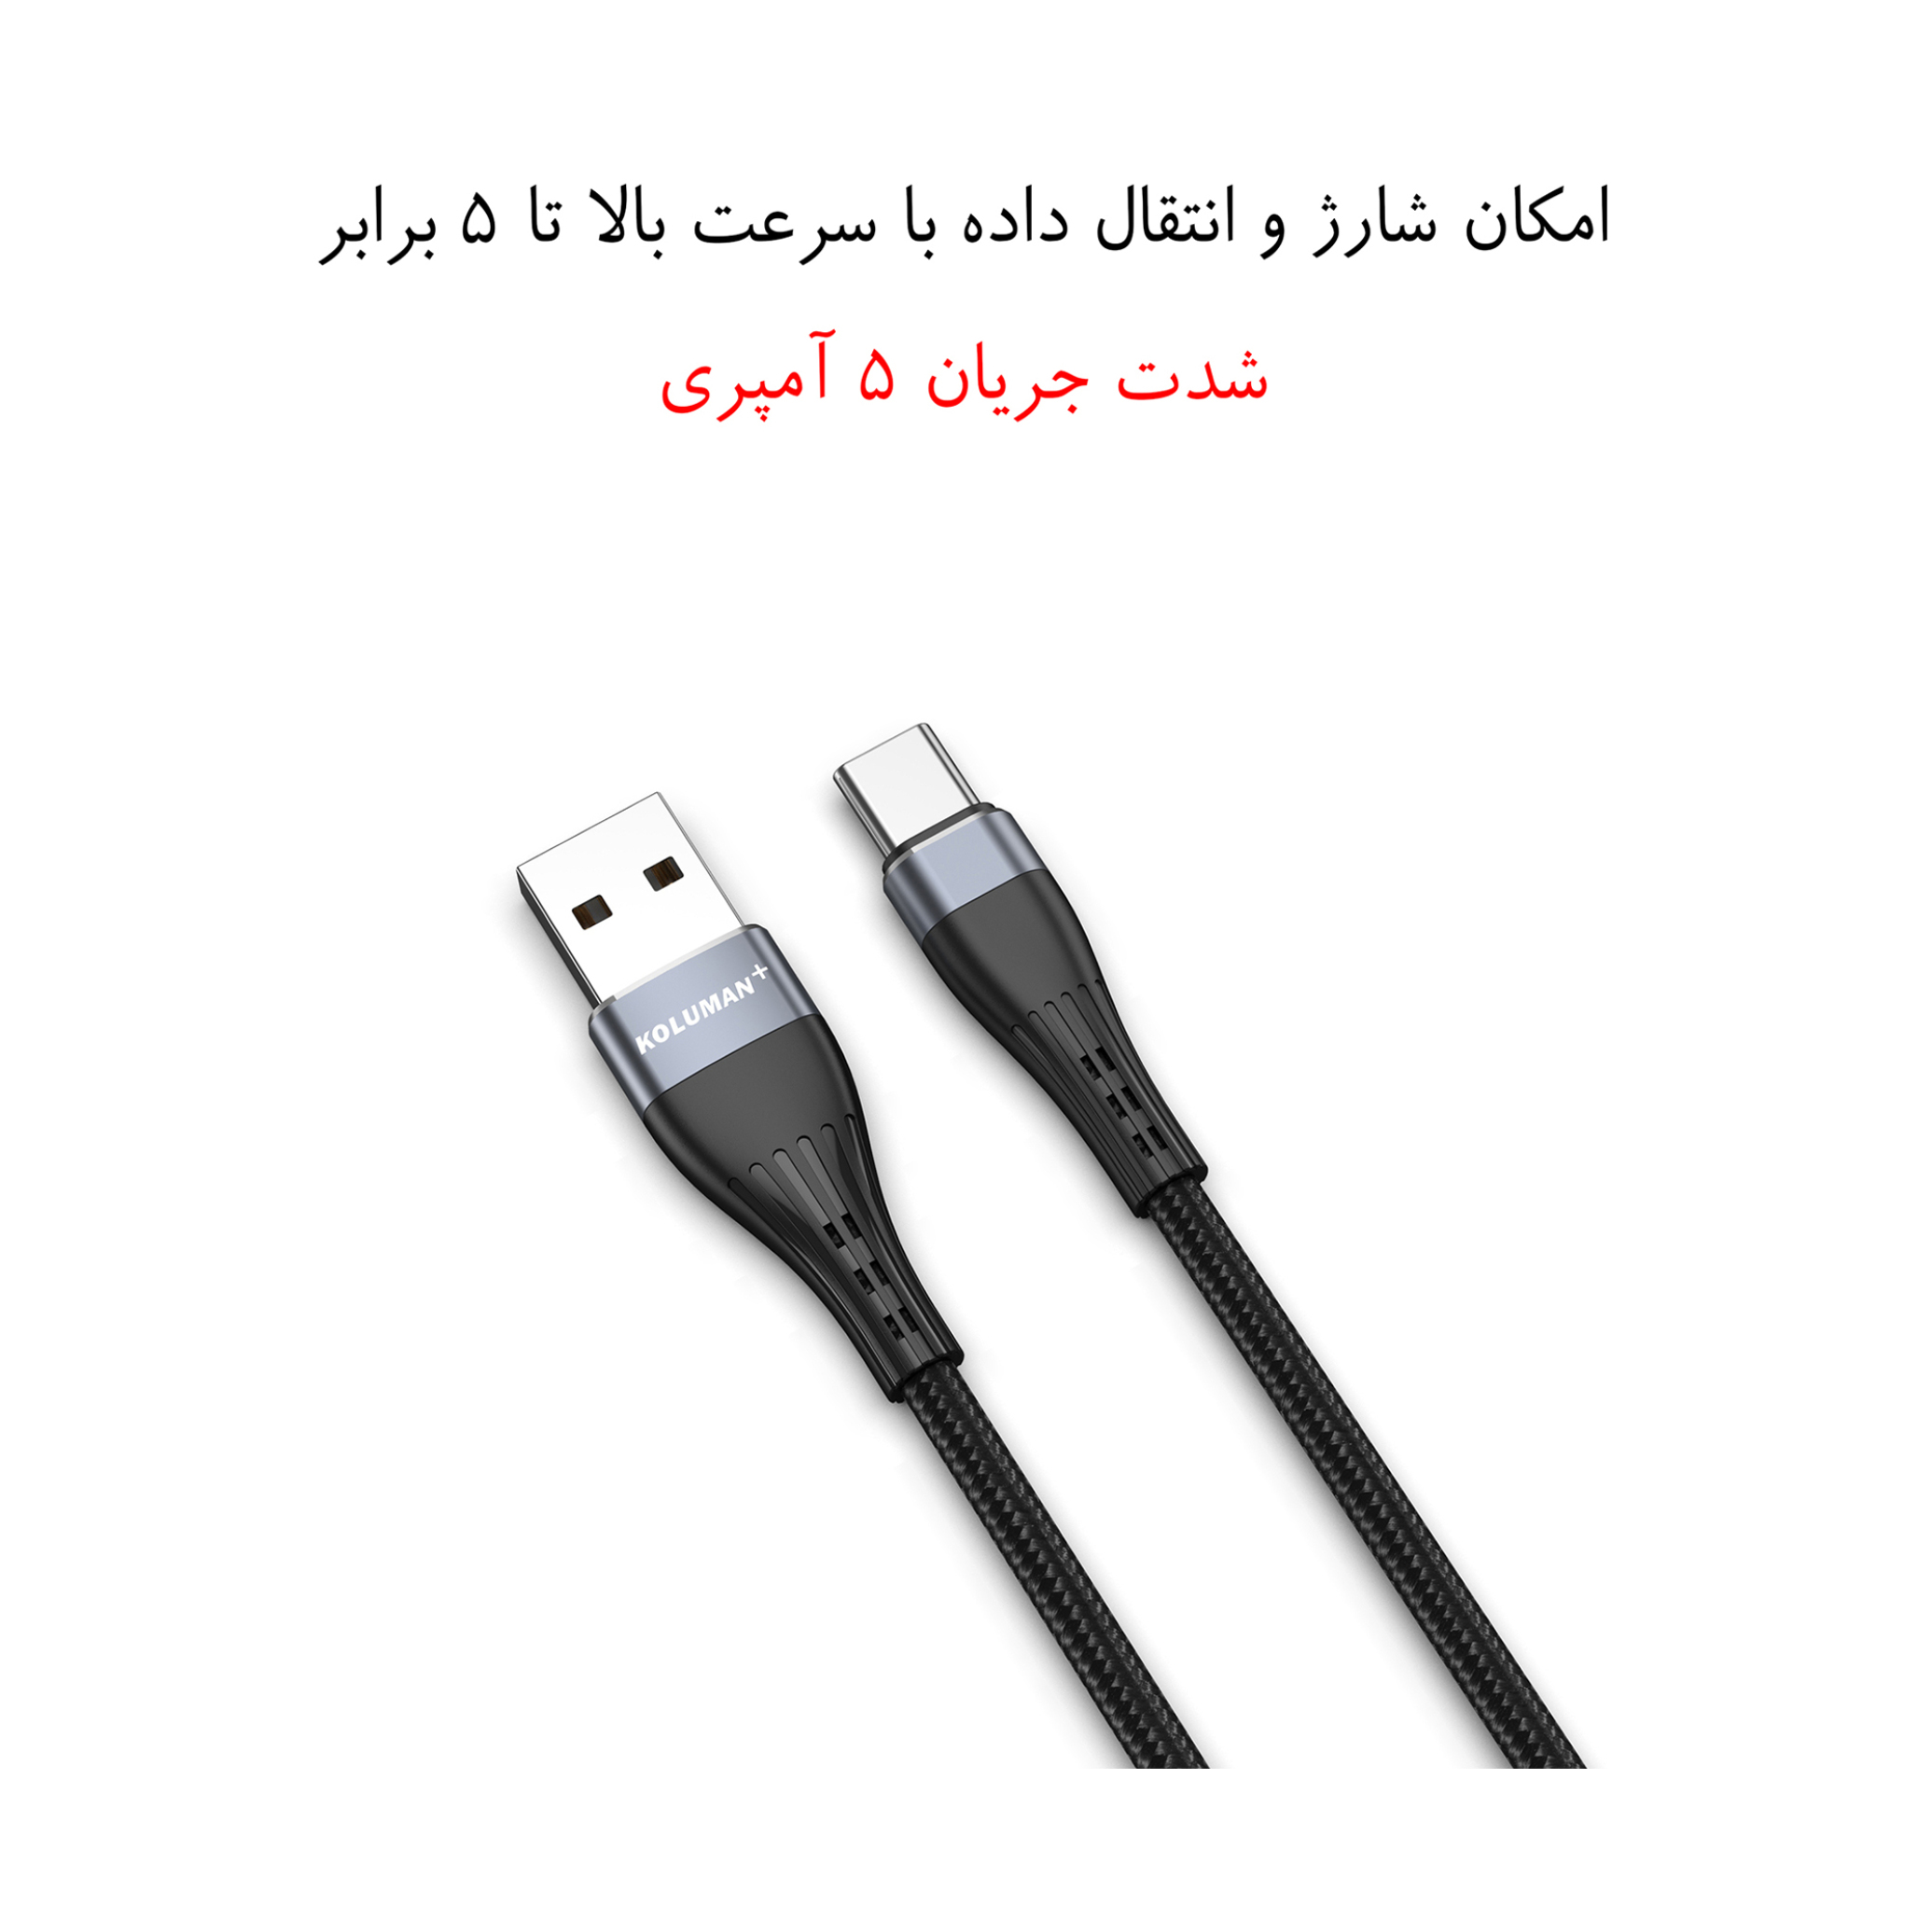 کابل تبدیل USB به USB-C کلومن پلاس مدل K11+